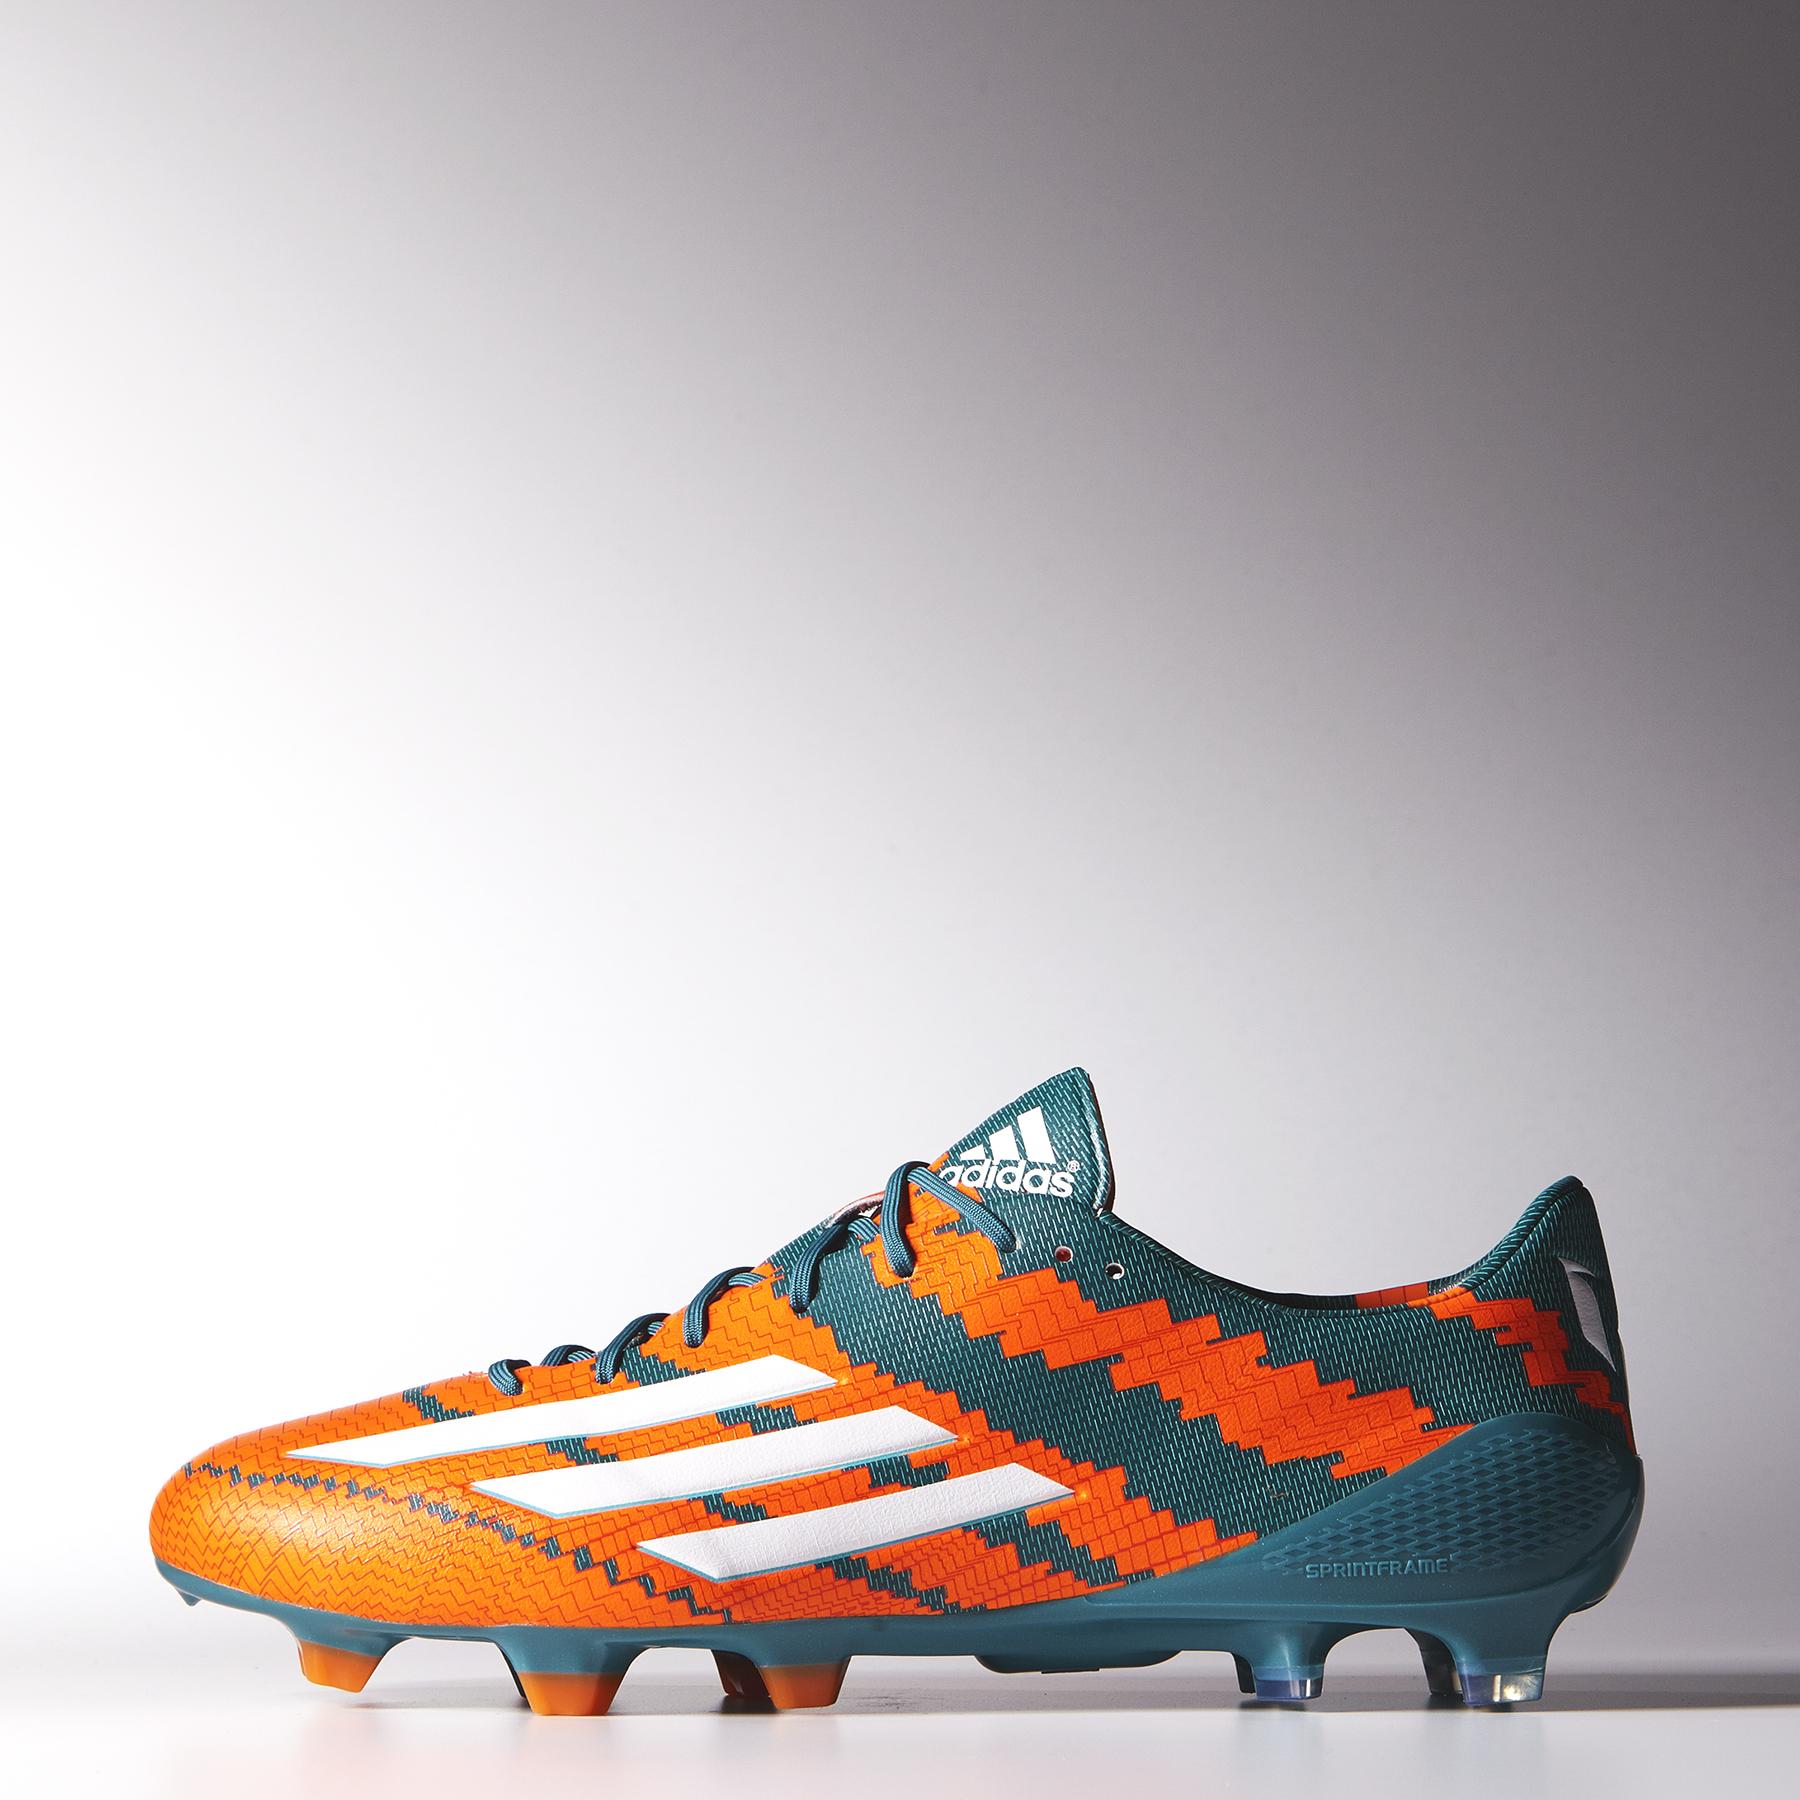 Adidas Messi 10.1 Firm Ground Football Boots Lt Blue